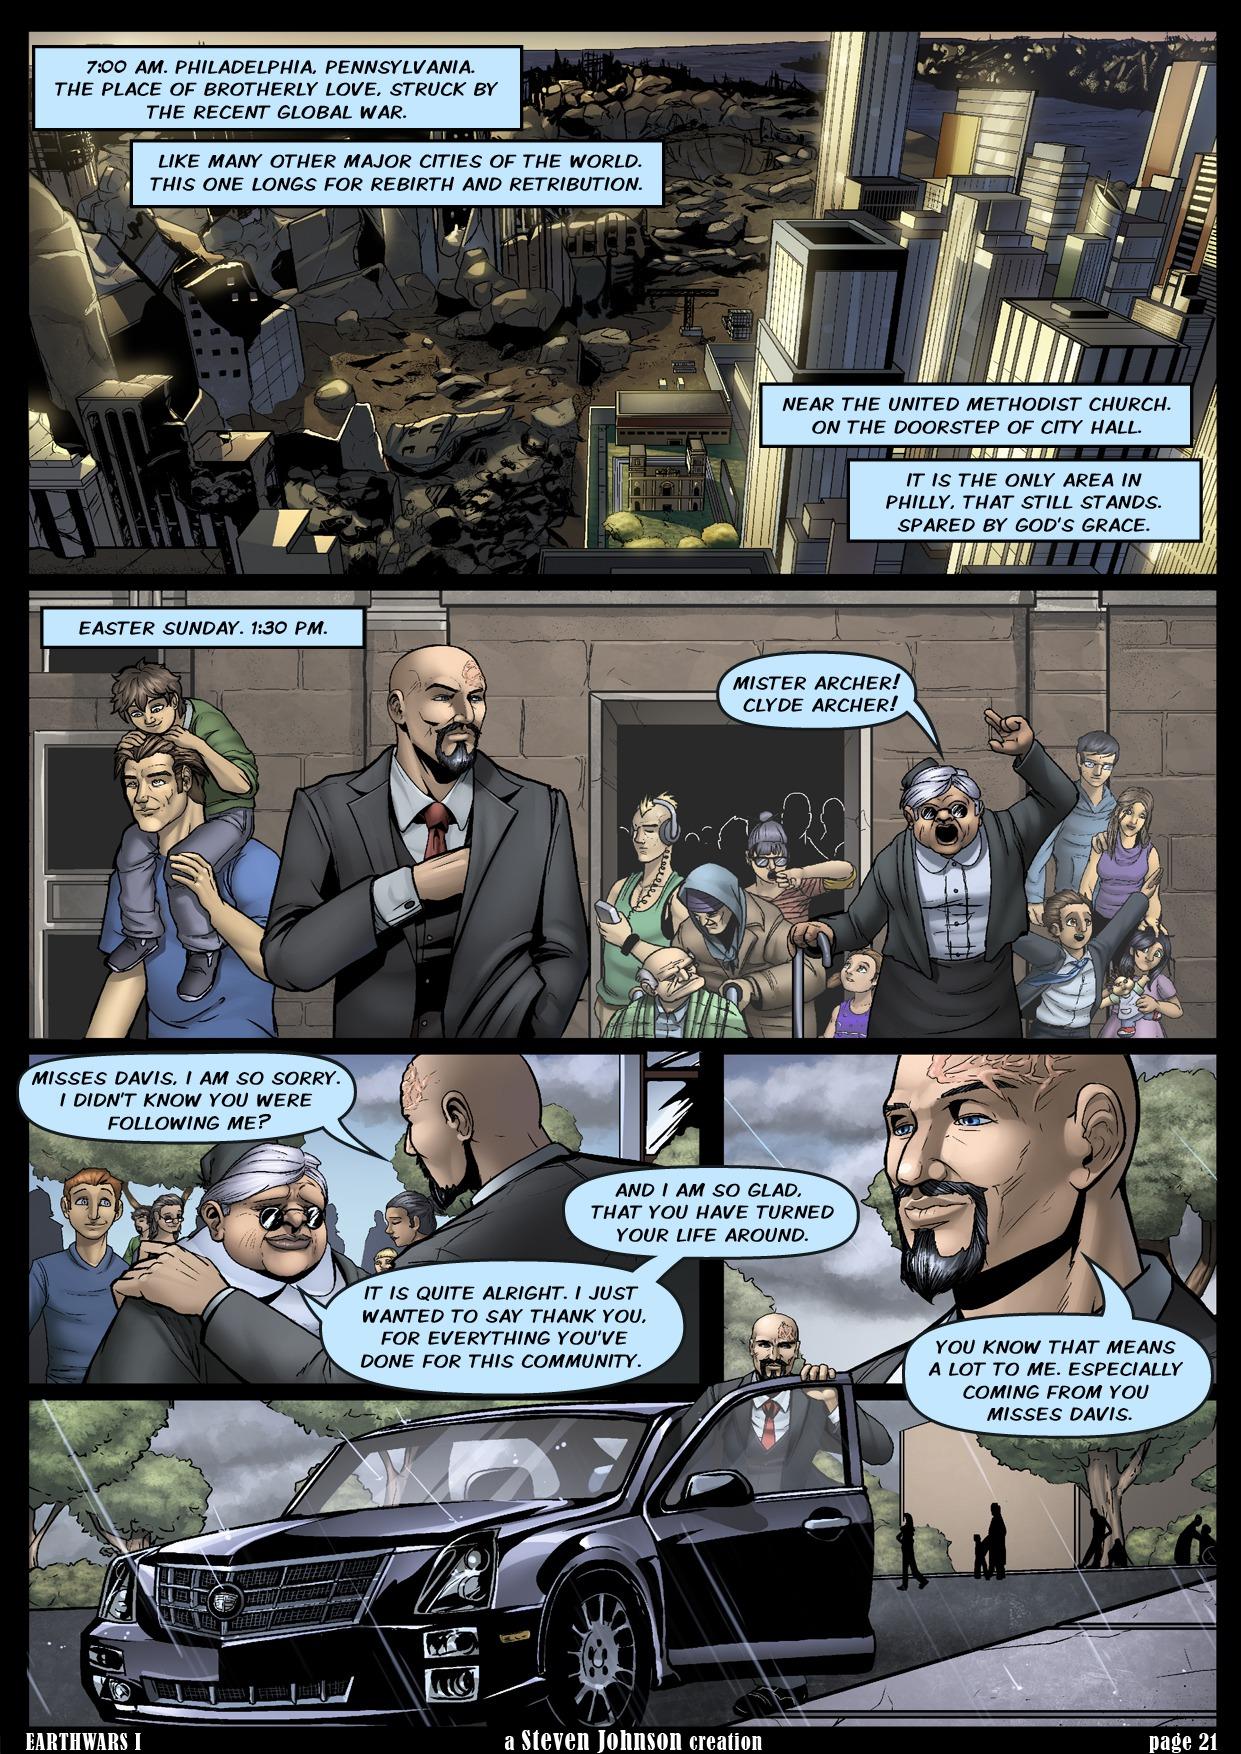 REVELATION RISE * Updated Twice A Month * follow me at: www.freelanced.com/stevenrjohnson